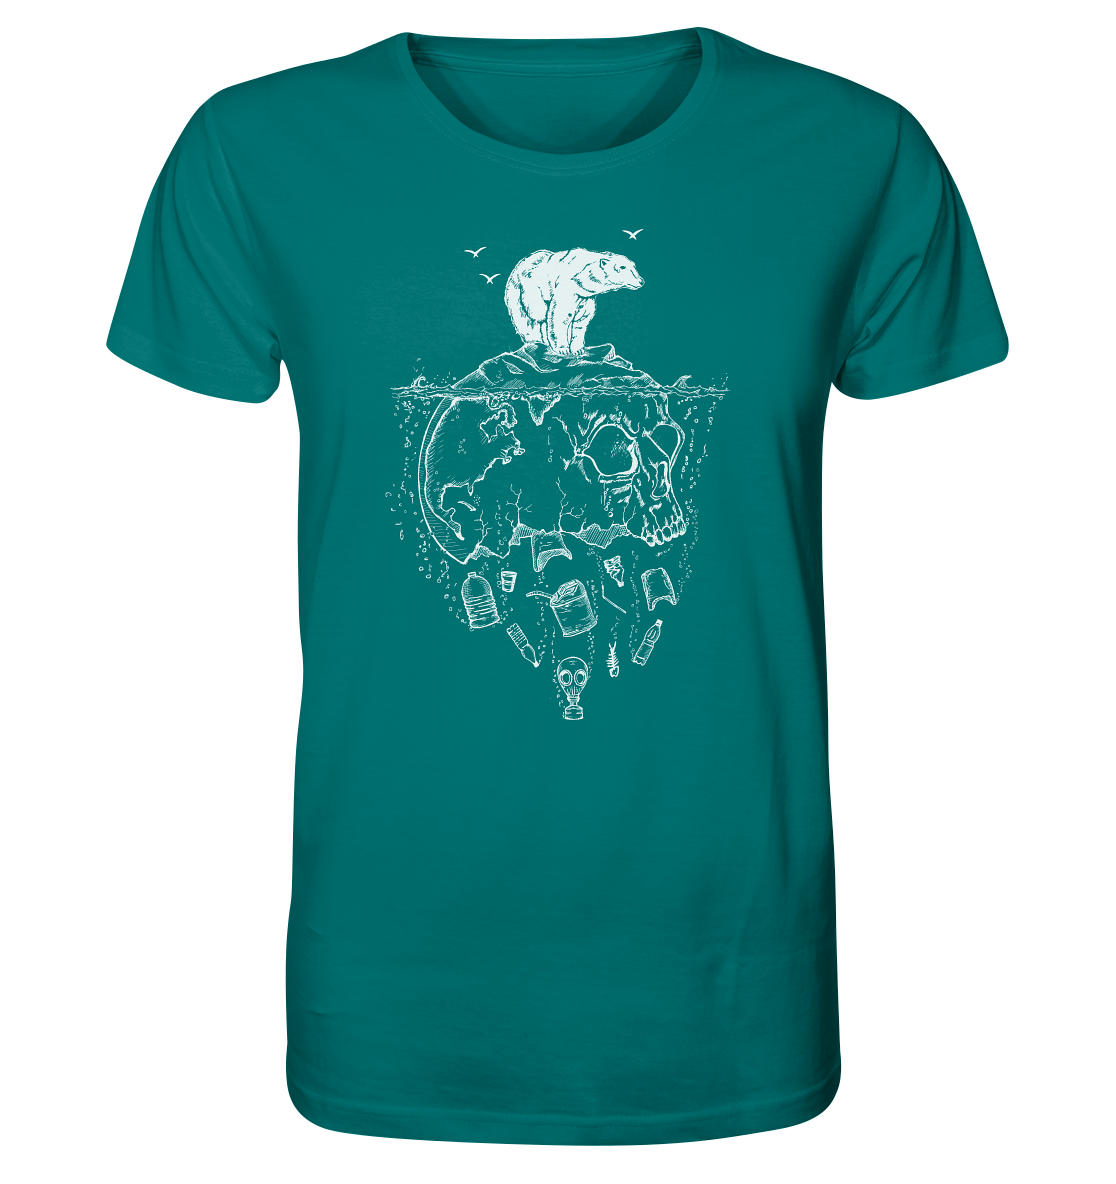 front-organic-shirt-007373-1116x-11.png